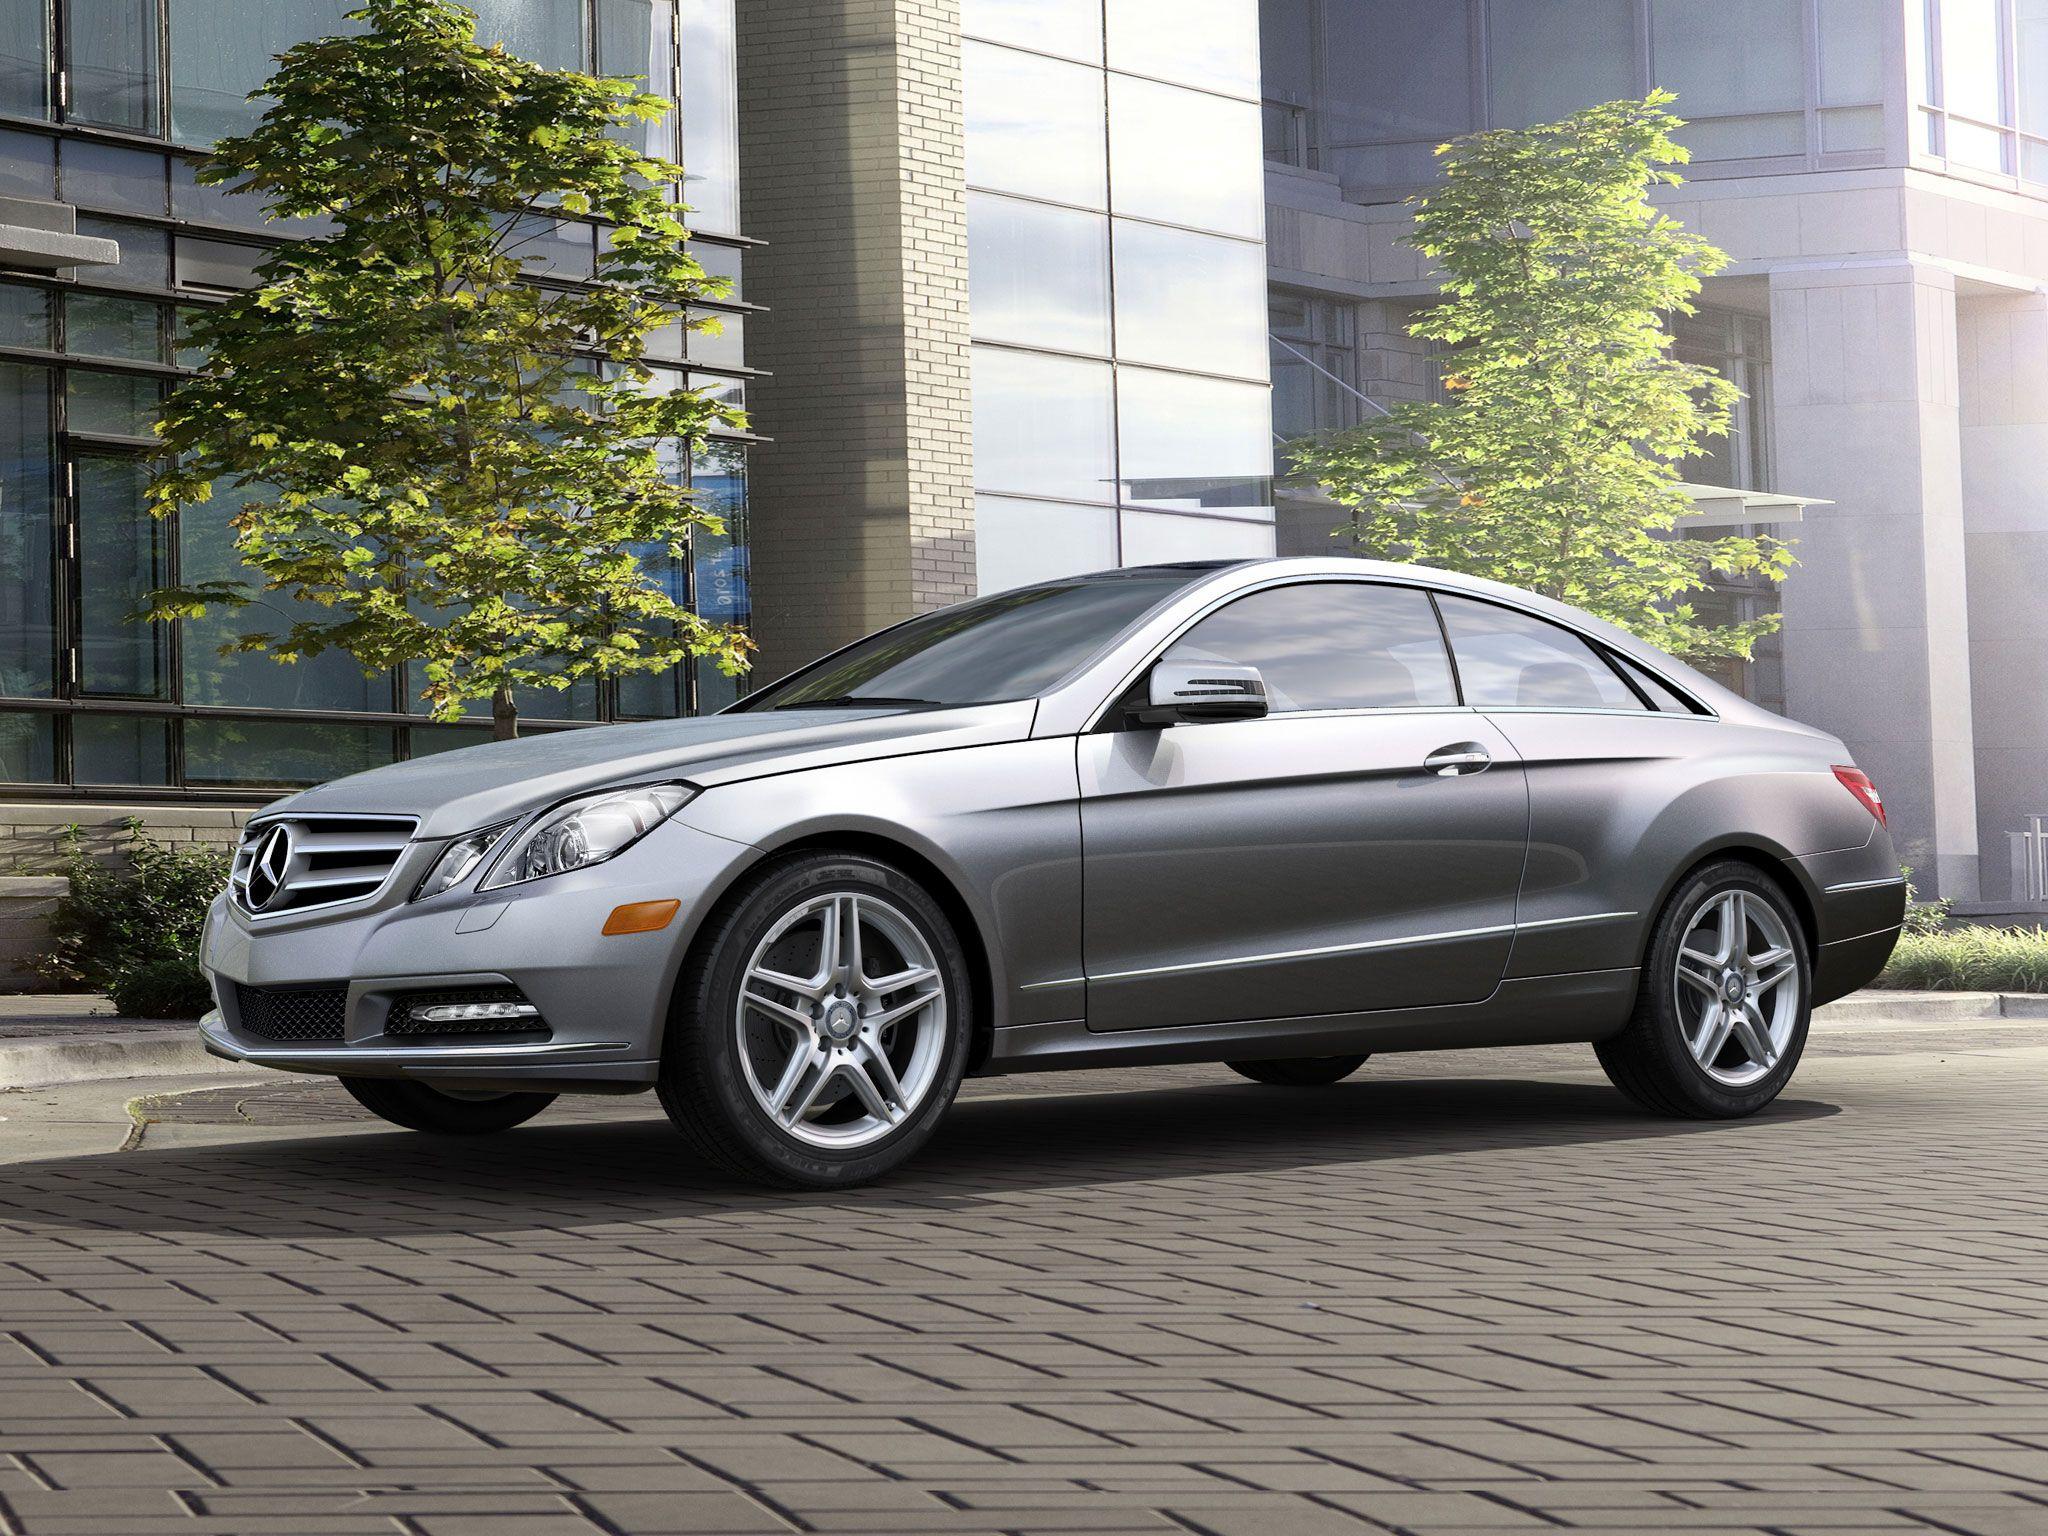 2013 Mercedes Benz E Class Cheap Car Rental Car Rental Company